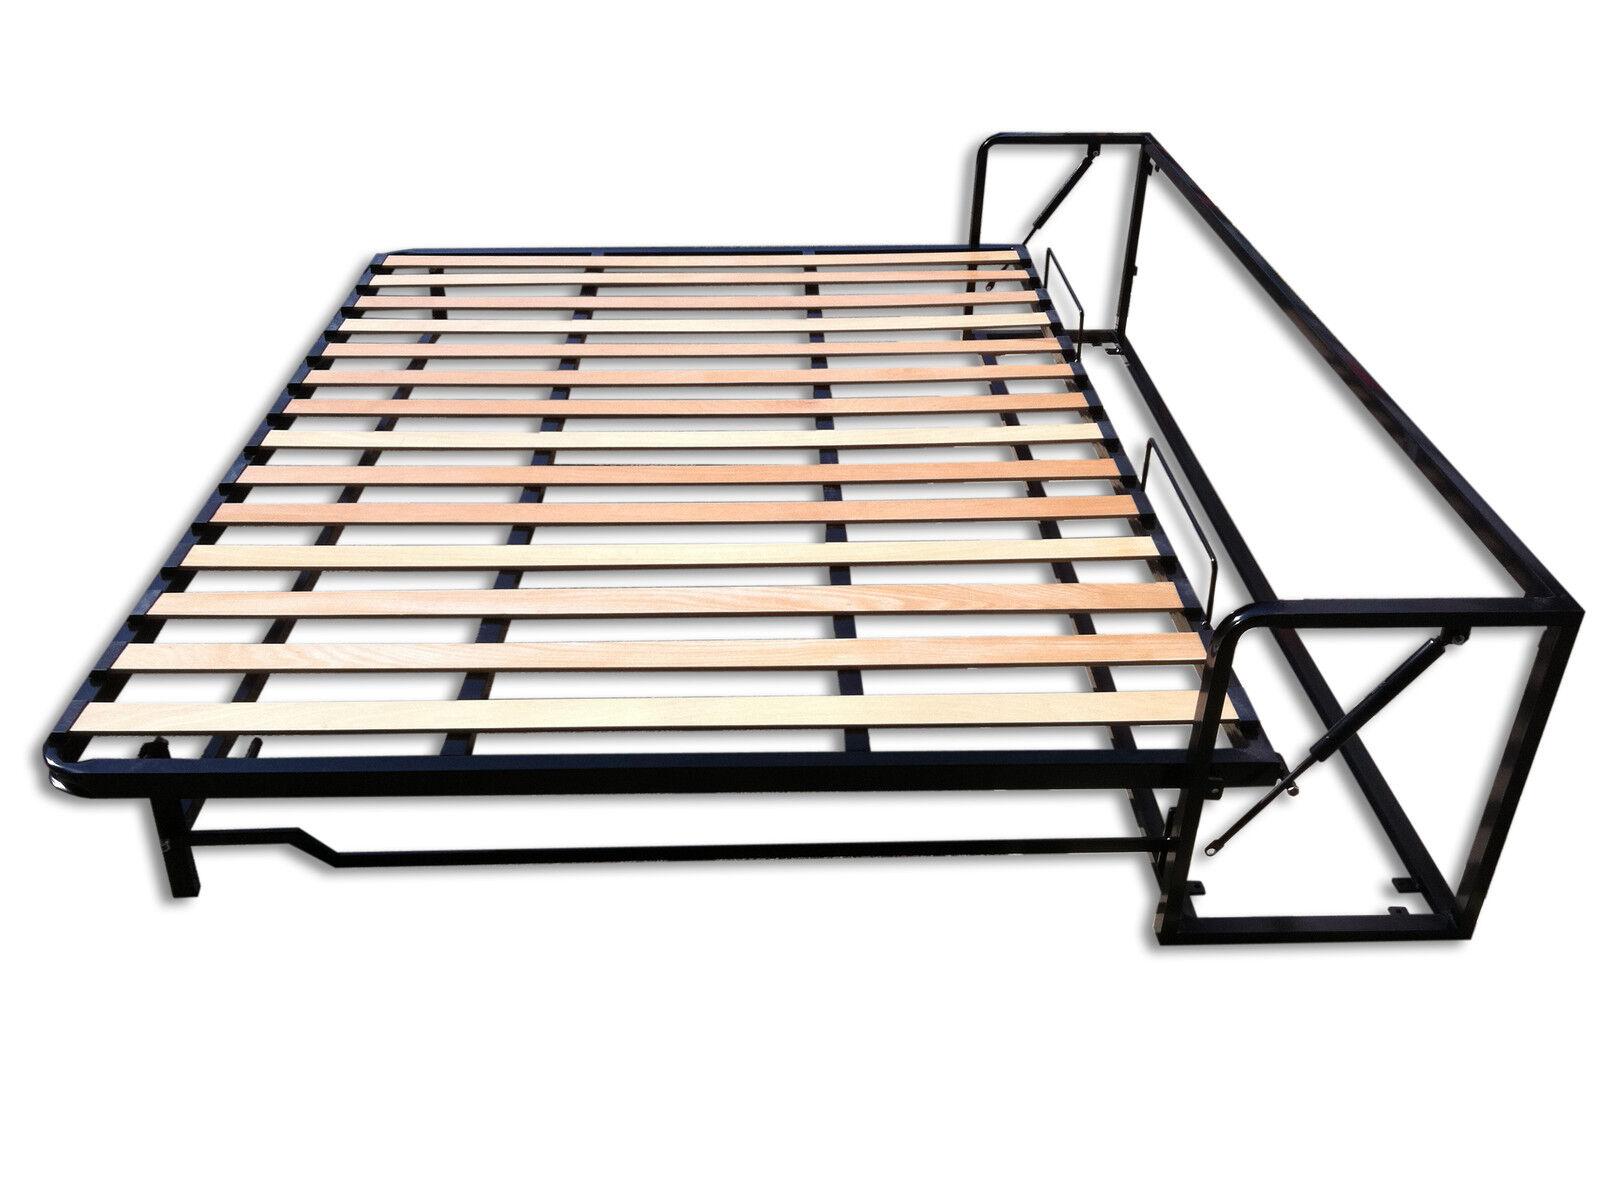 Somier cama abatible horizontal cama empotrable horizontal for Cama abatible horizontal